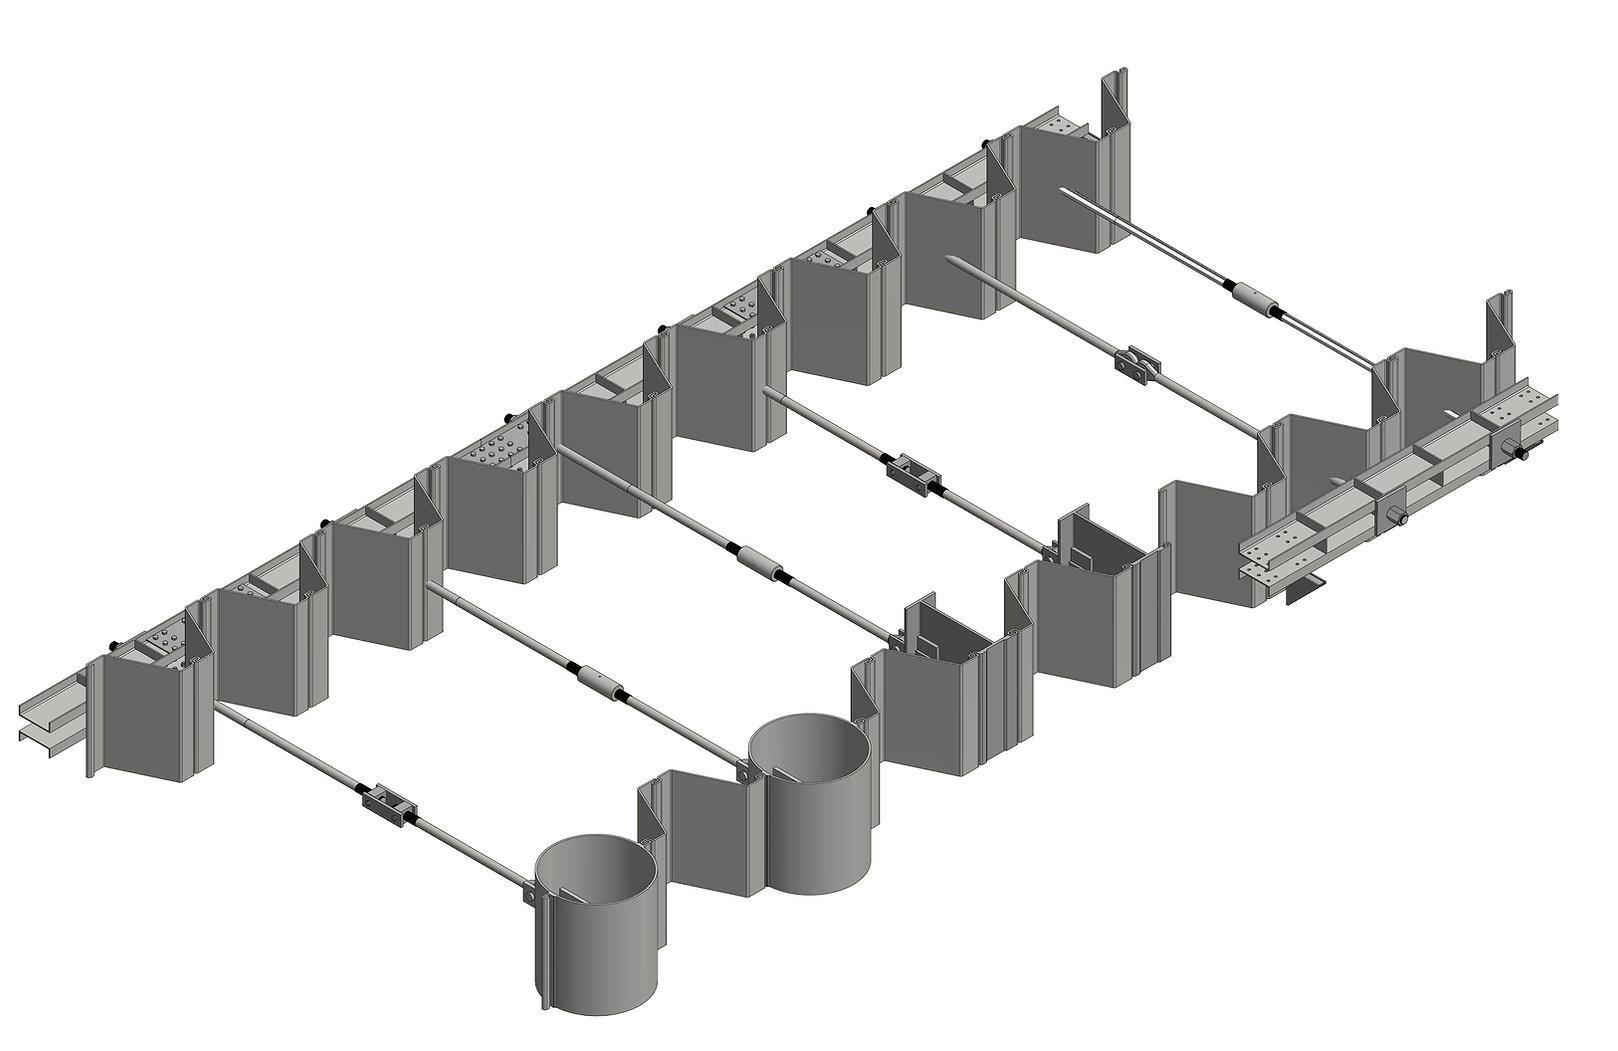 Tie rod system